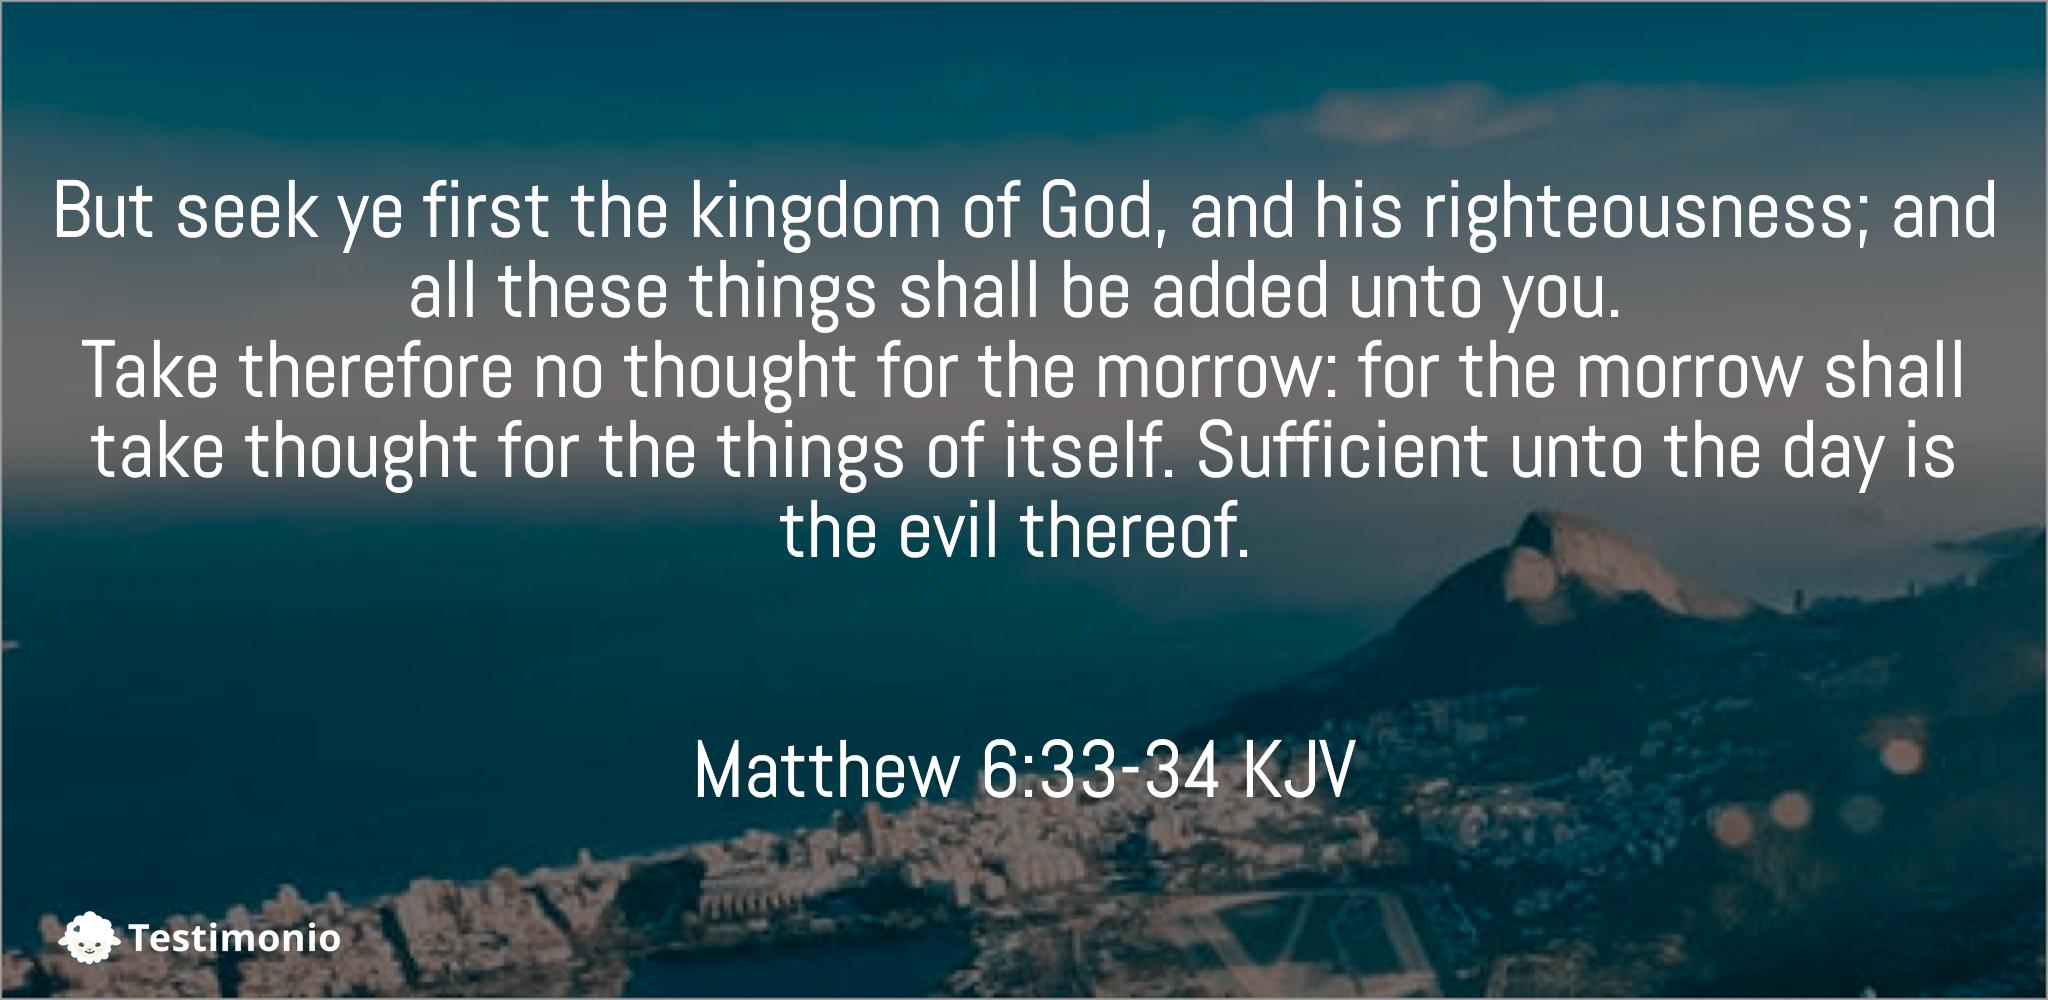 Matthew 6:33-34